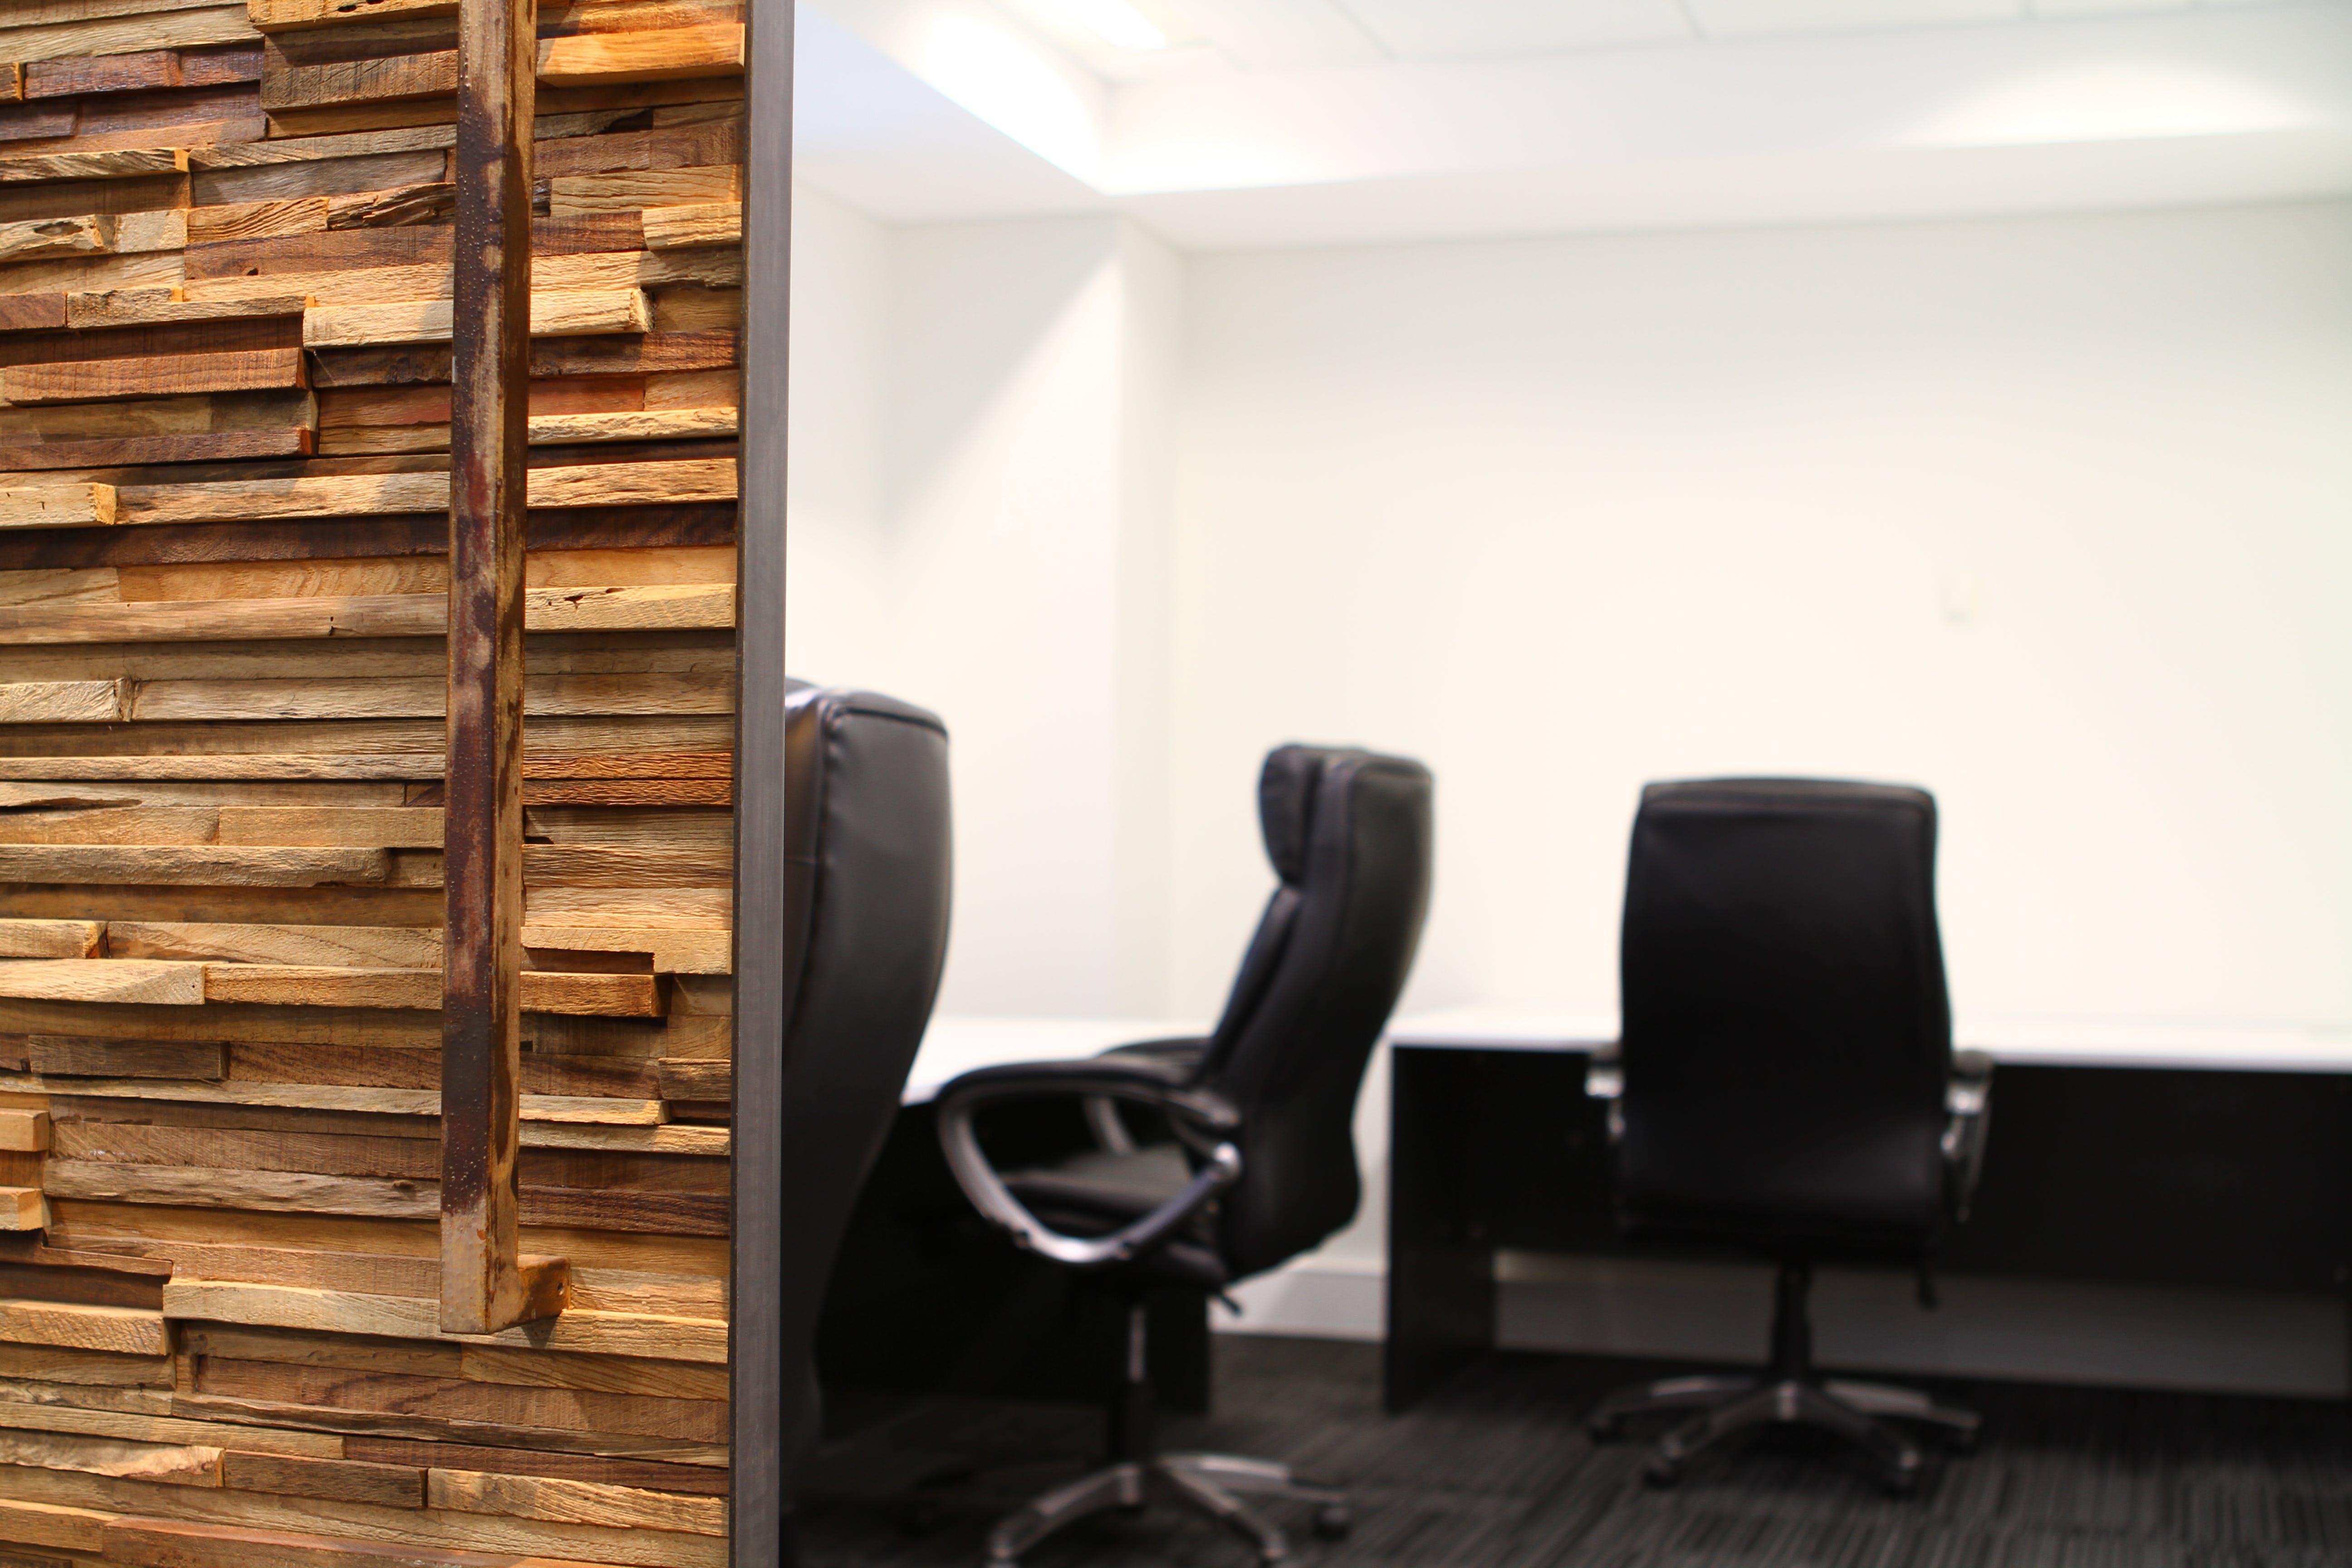 Hot desk at Officenexus, image 6